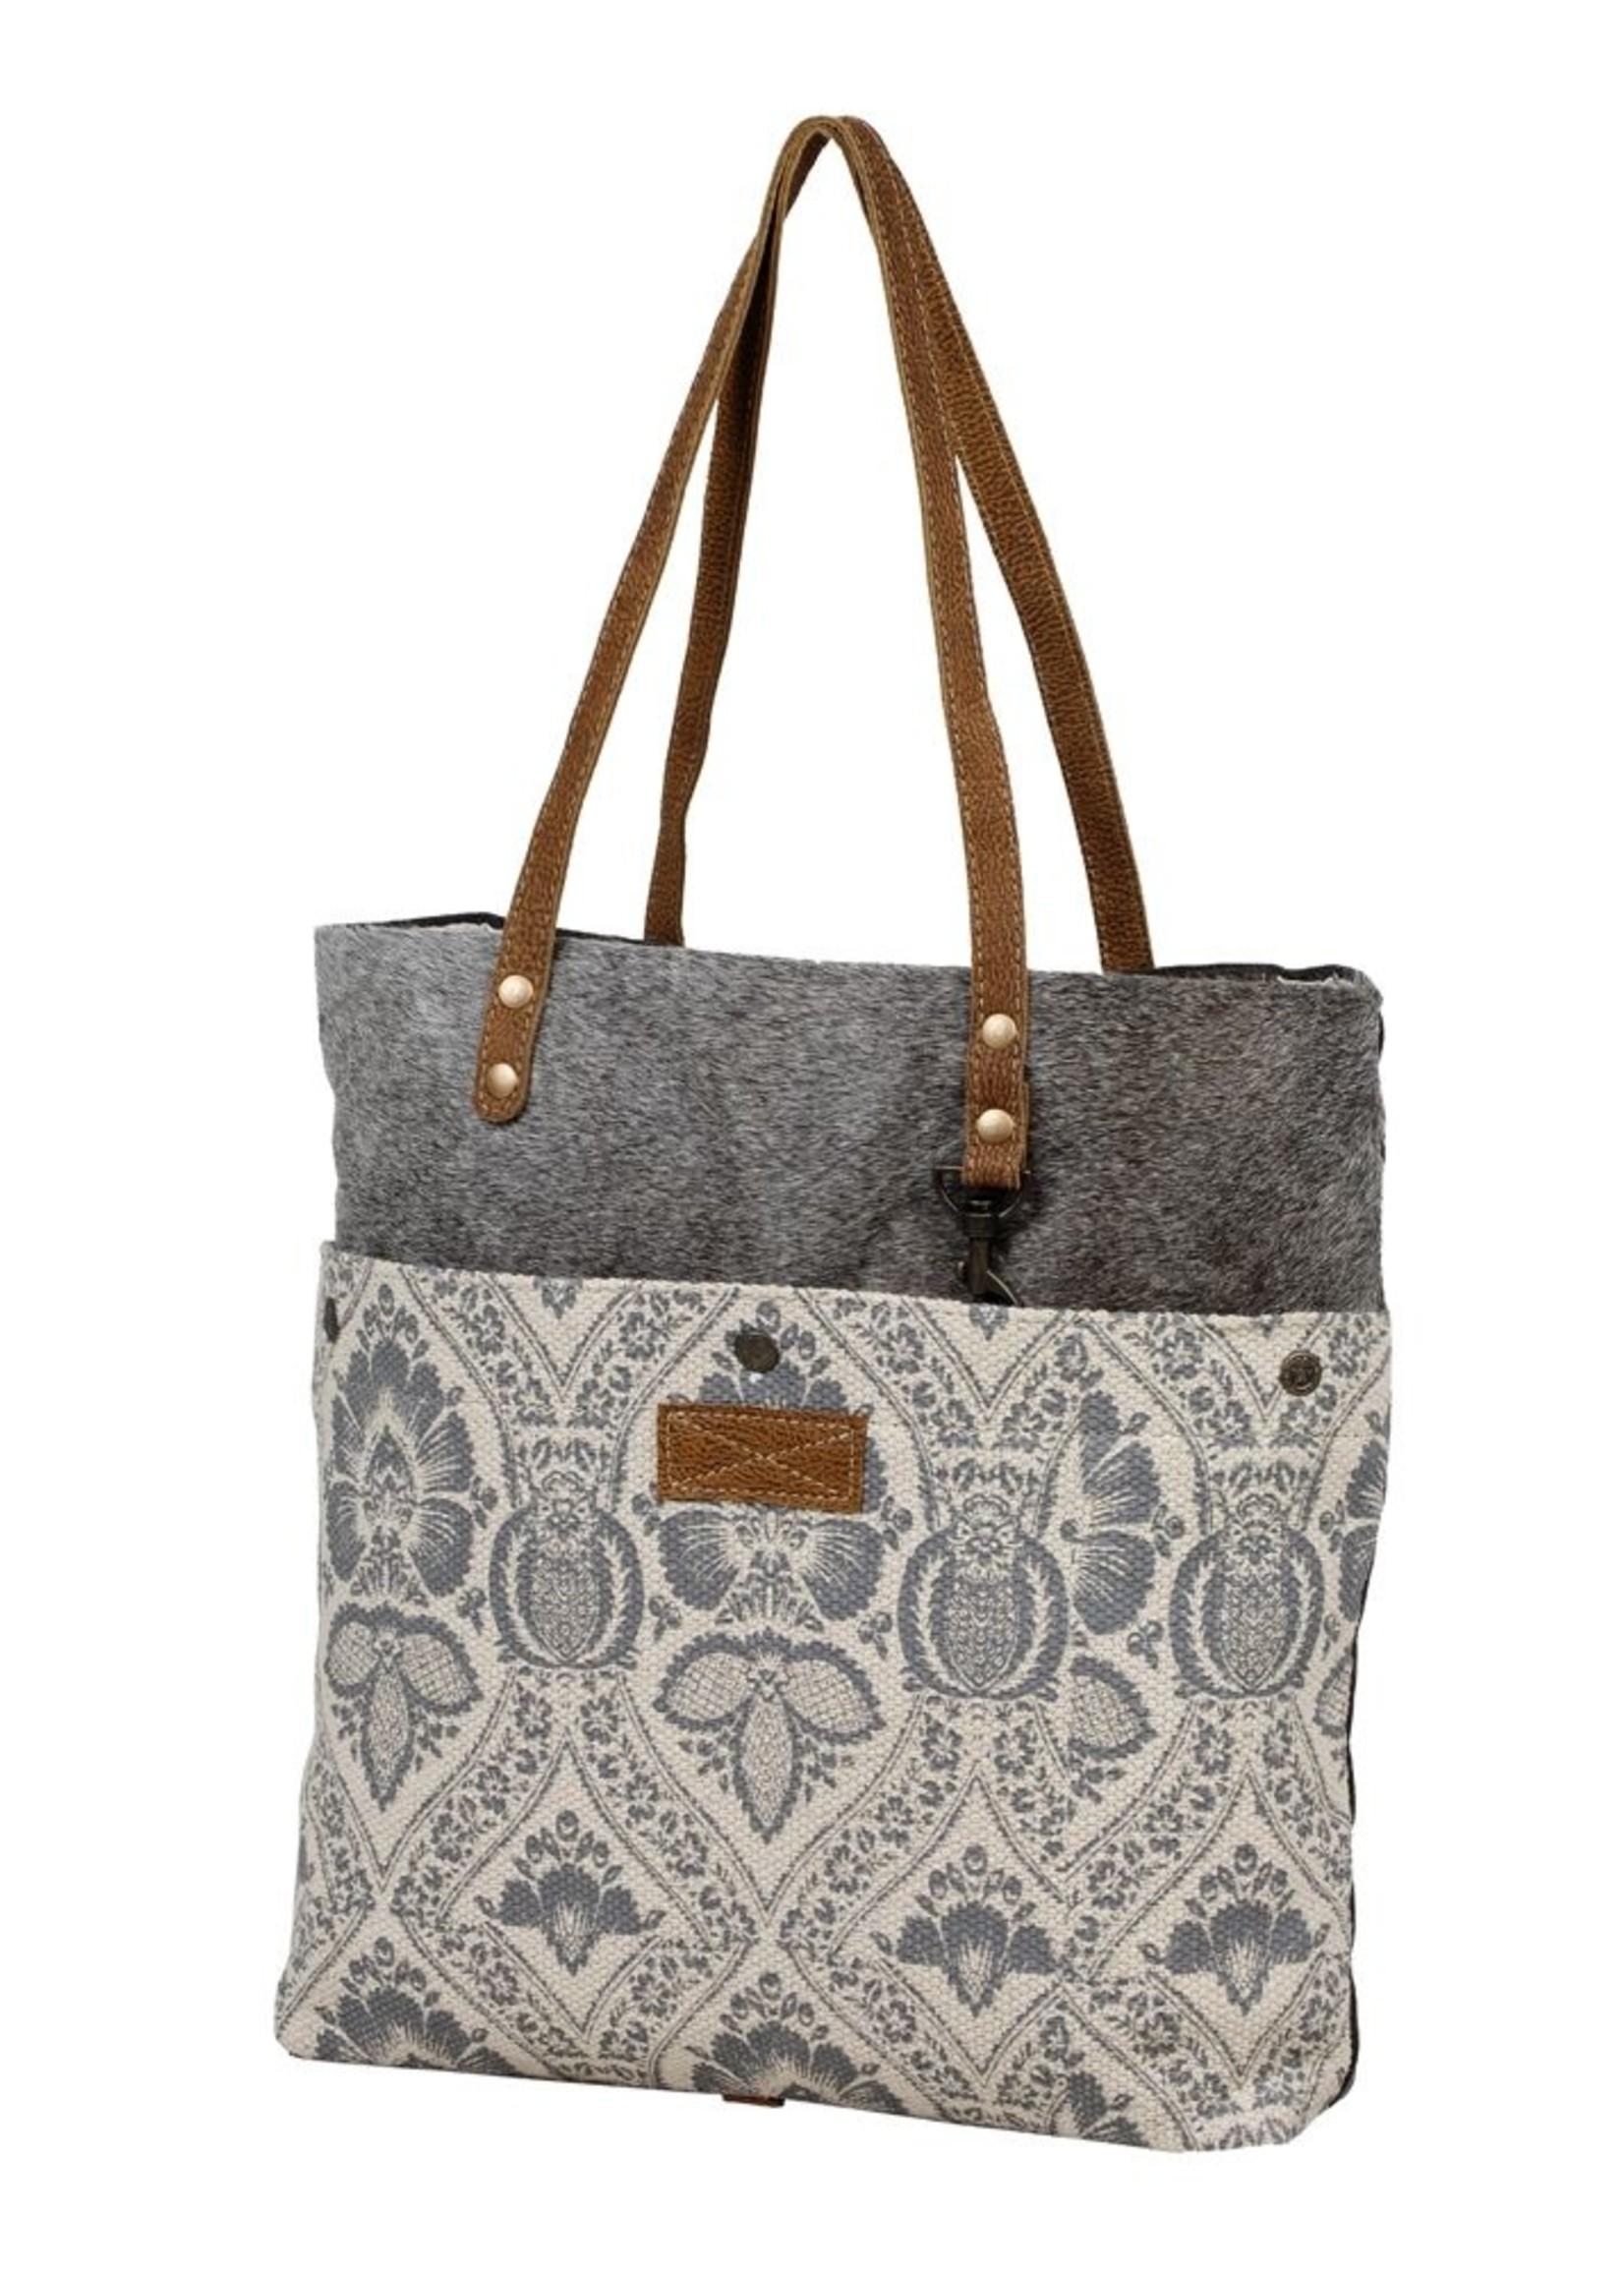 Captivate Tote Bag